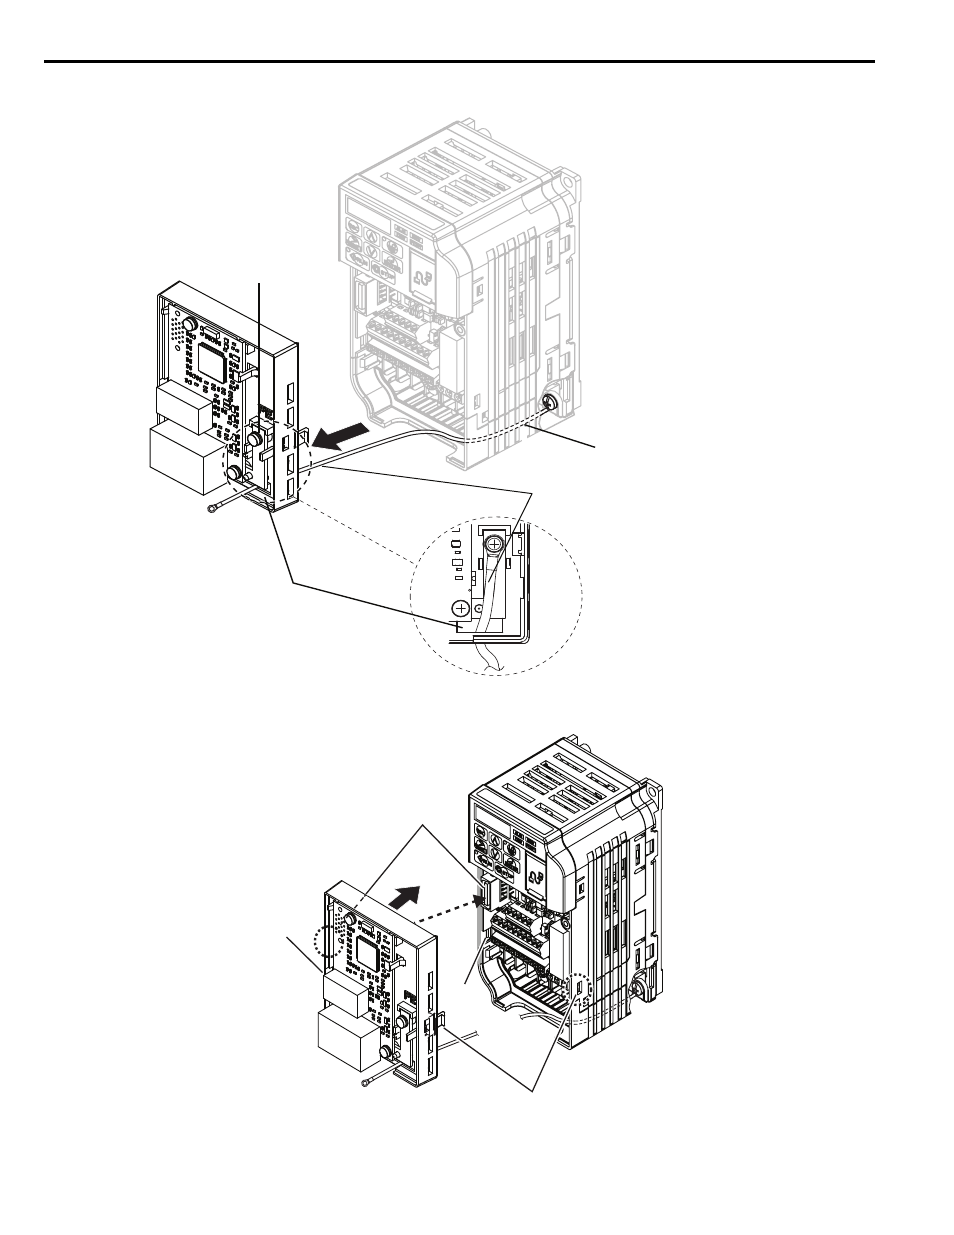 6 procedure a – Yaskawa V1000-Series Option SI-EP3/V PROFINET User Manual